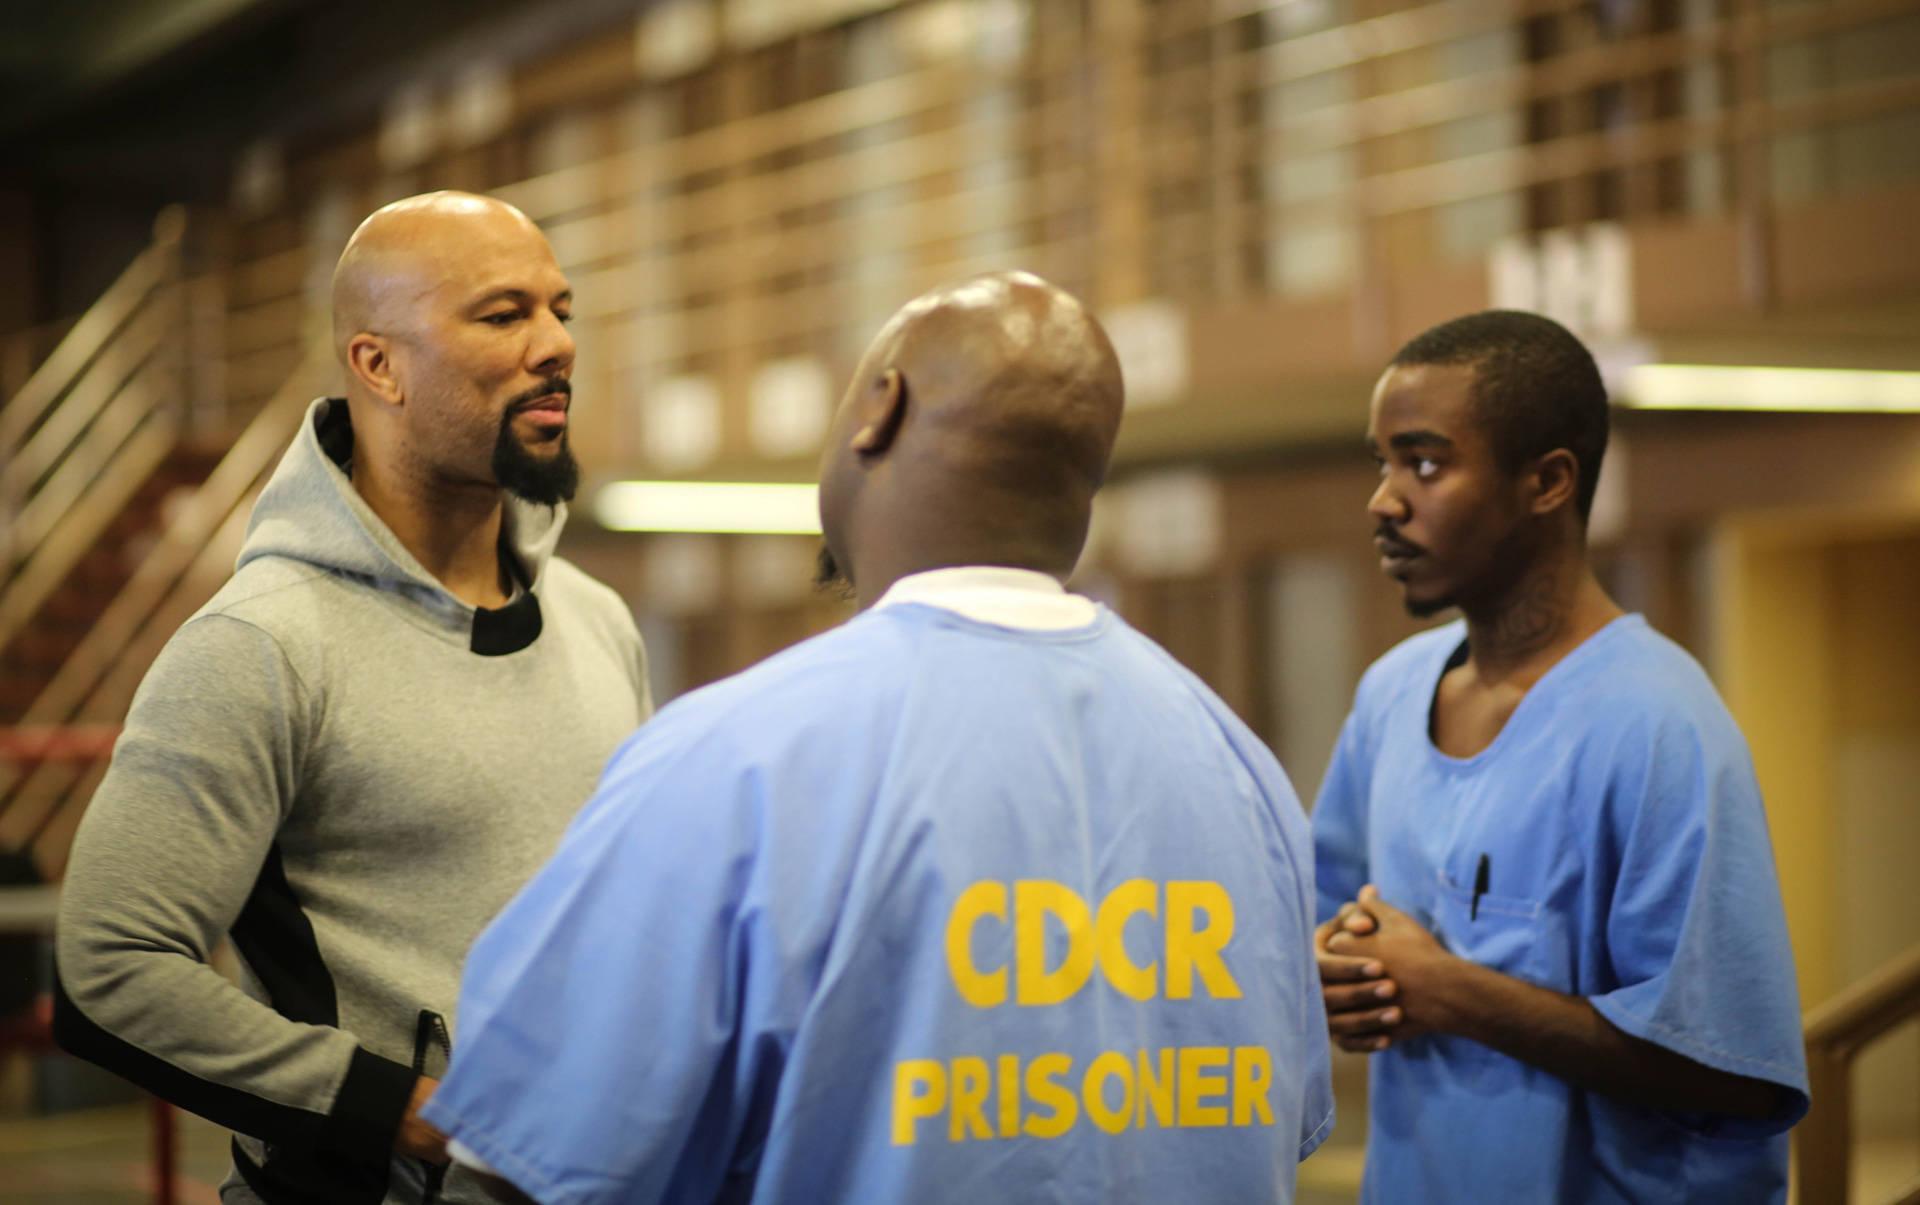 Hip-hop artist Common meets with inmates at a California prison.  Sade C. Joseph